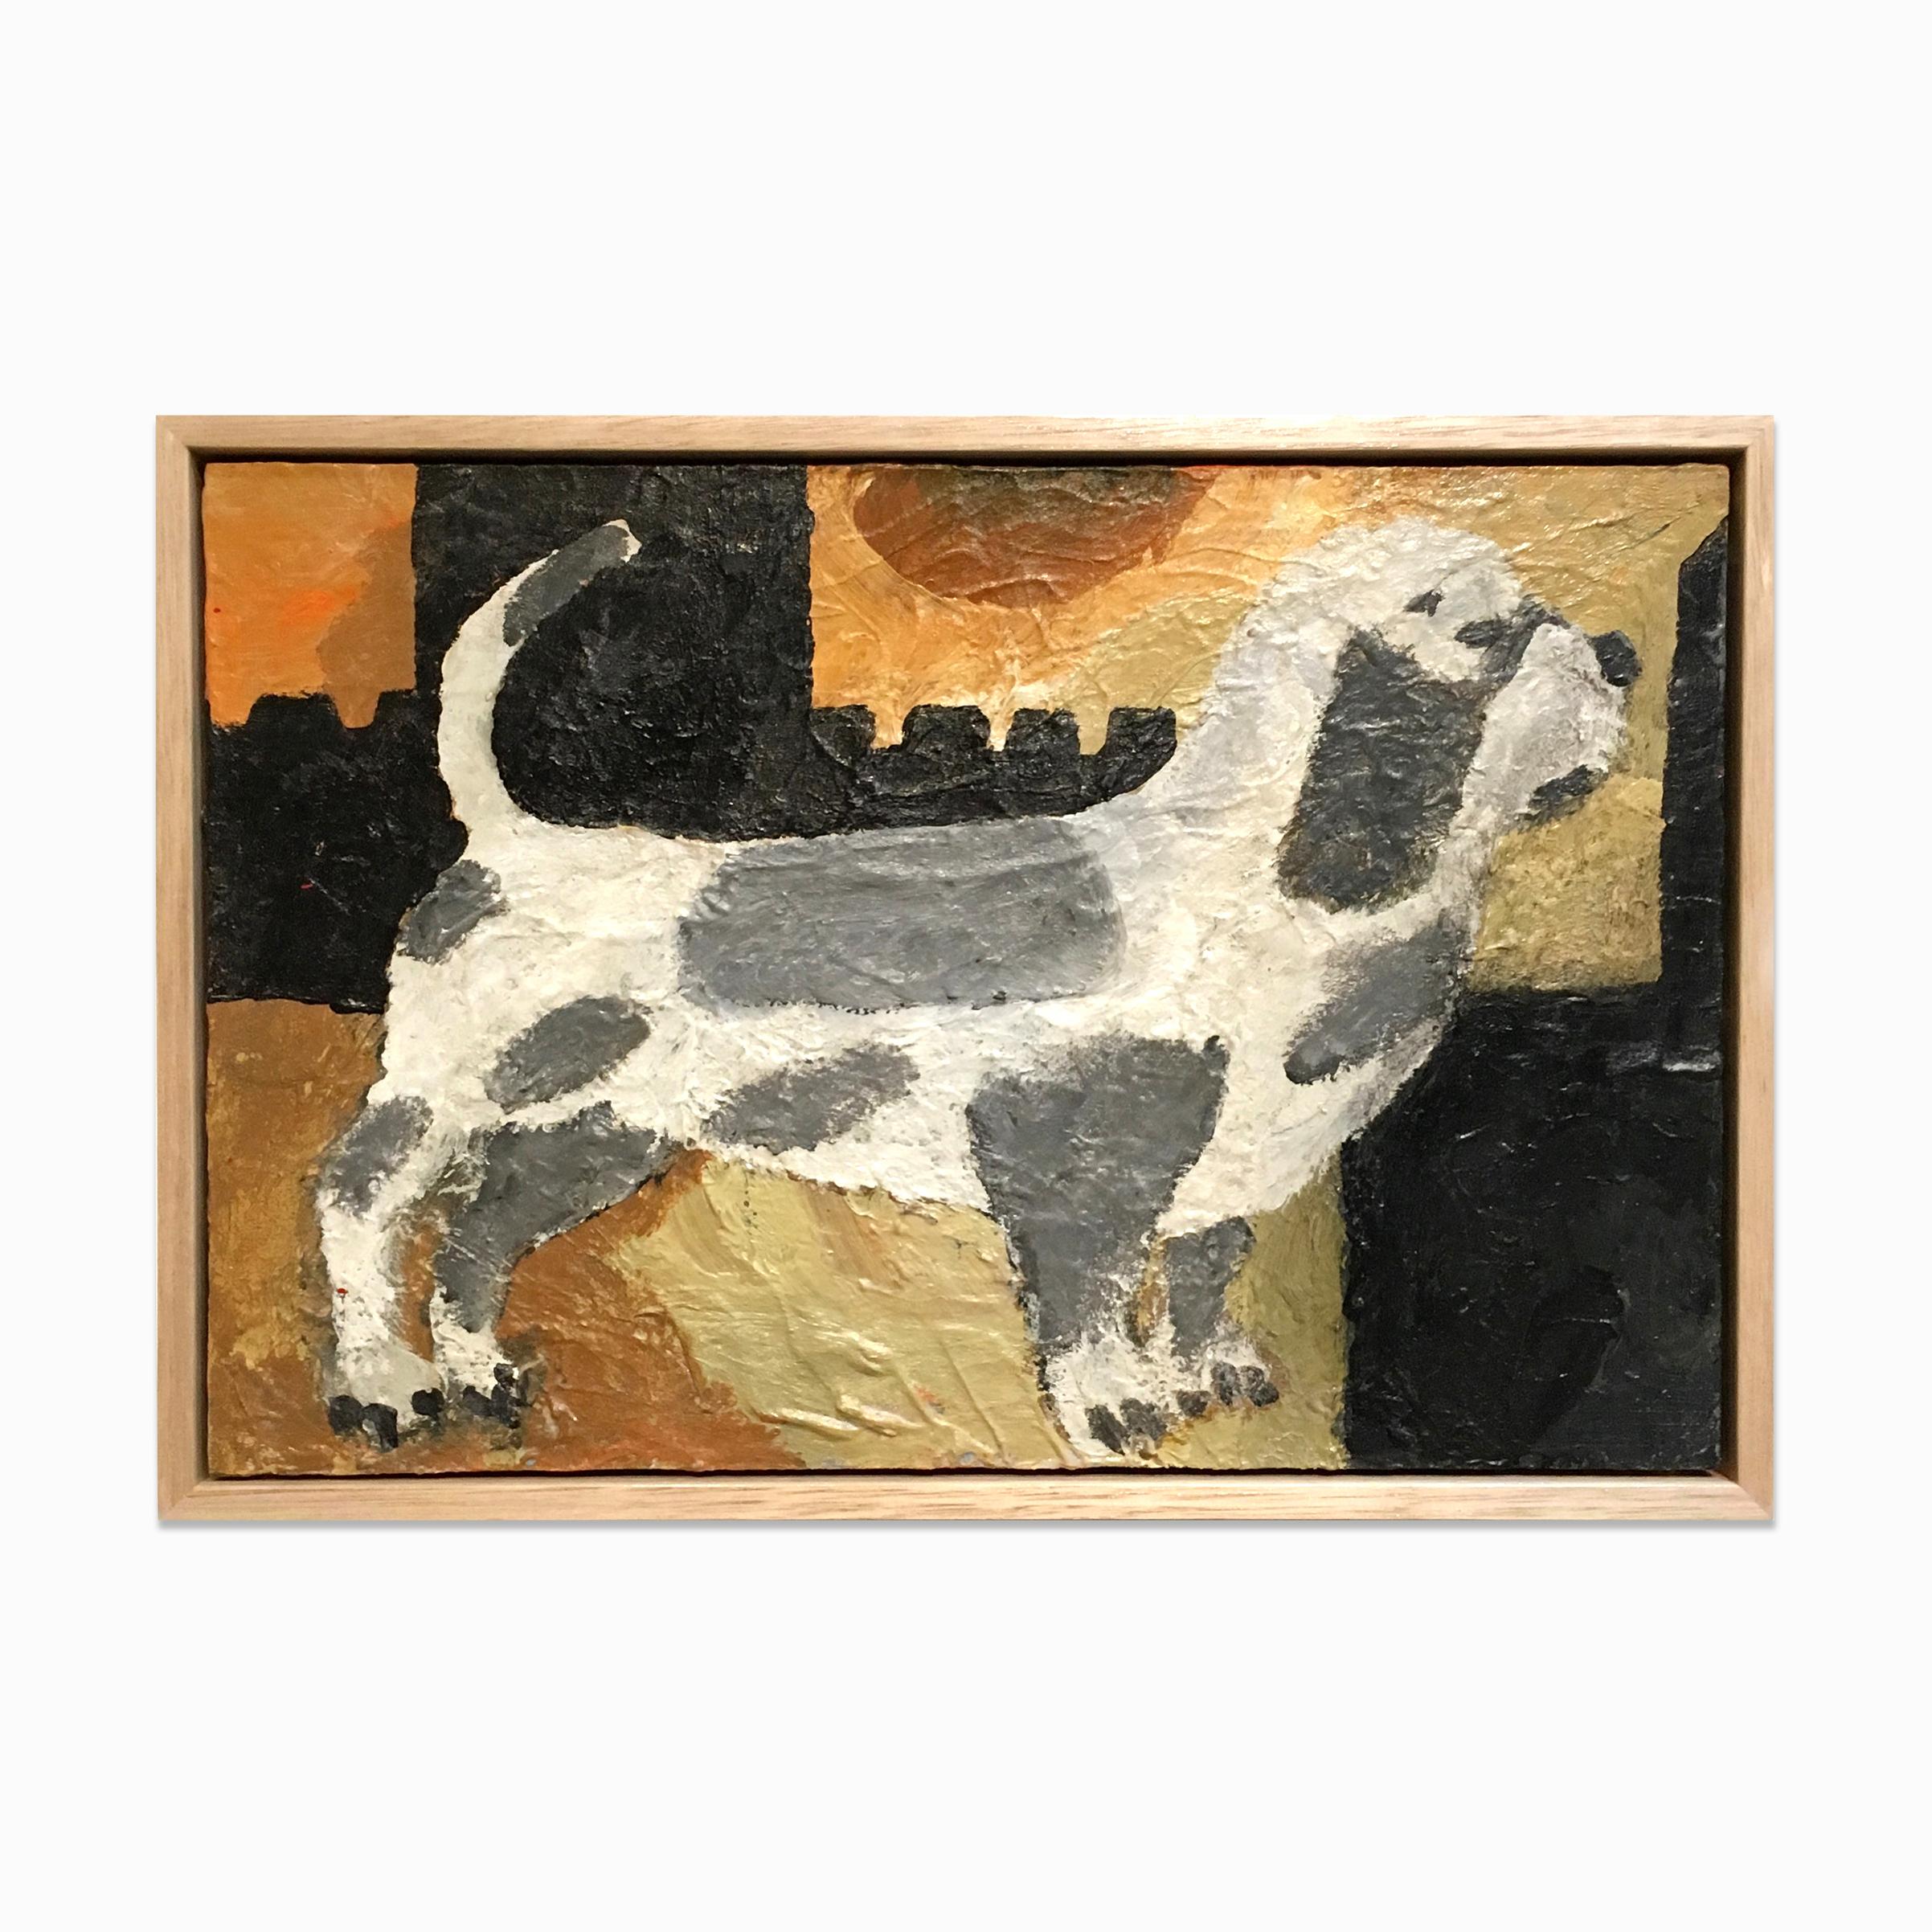 Just call it Dogboy  Acrylic on board 450 x 300mm  2016